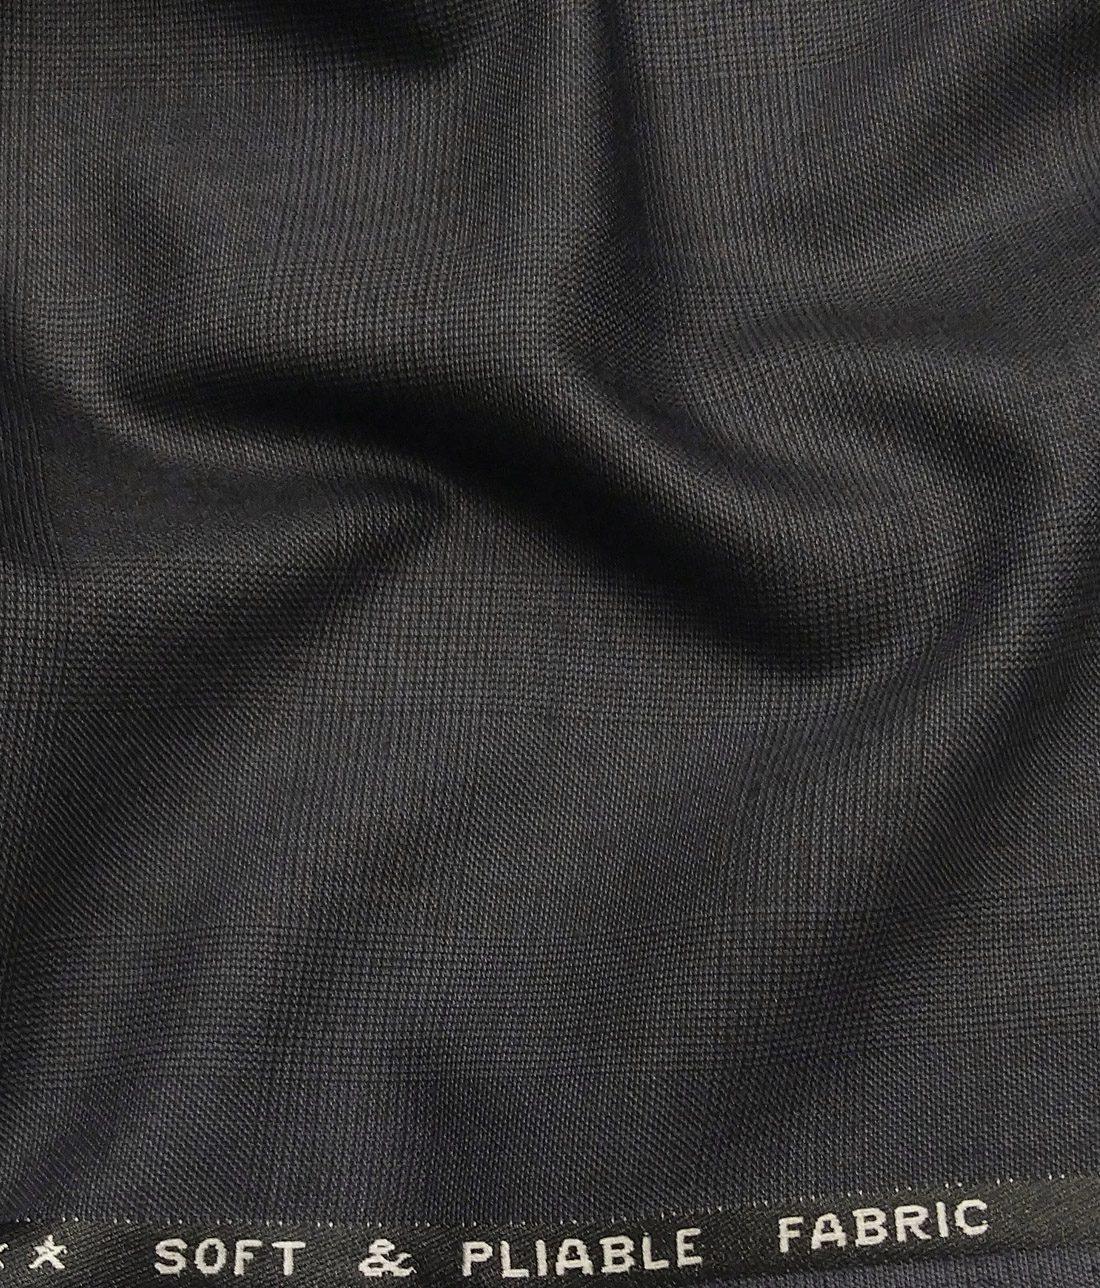 7b6eb176c Raymond Dark Shadow Grey Polyester Viscose Self Checks Unstitched Suiting  Fabric - 3.75 Meter